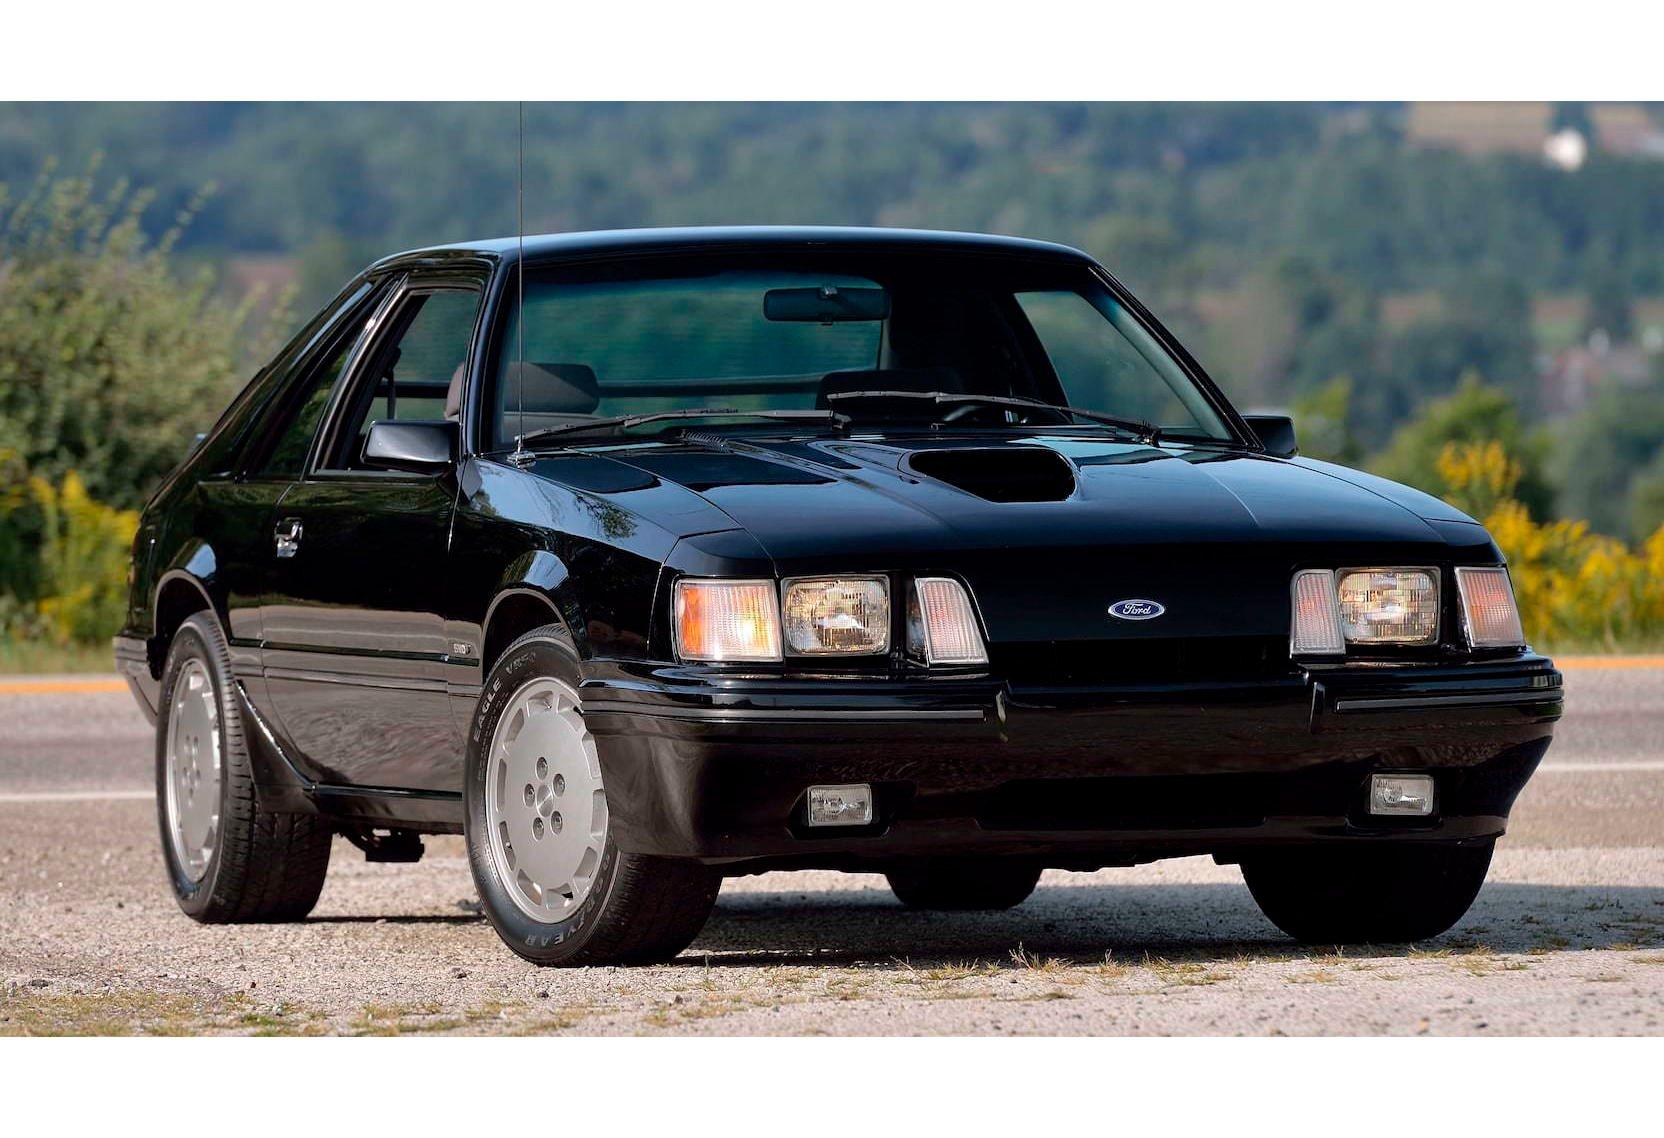 Ford-Mustang-SVO